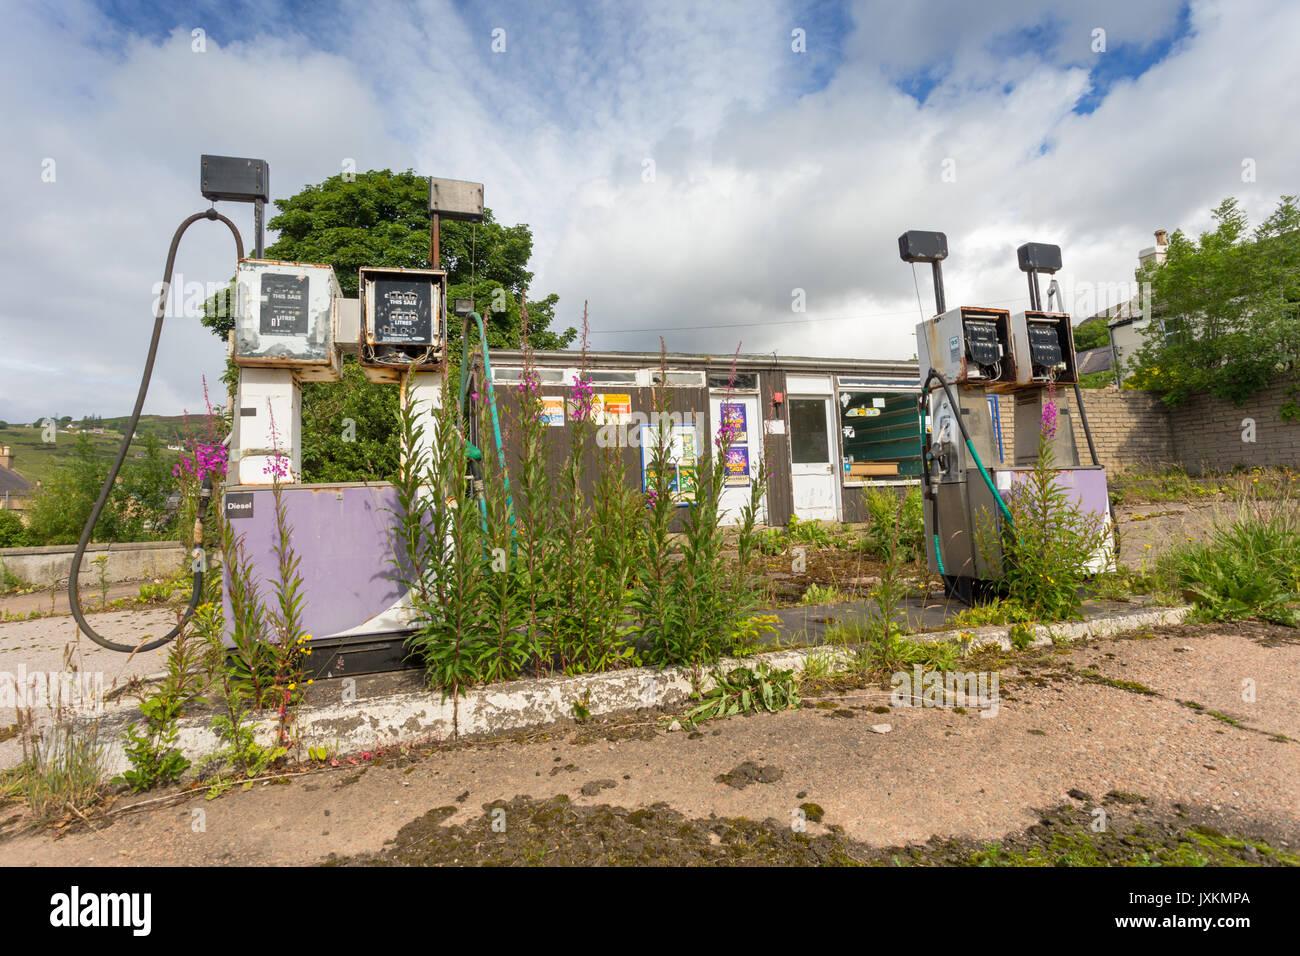 Petrol fuel gas garage forecourt shut down in rural Scotland Helmsdale UK - Stock Image